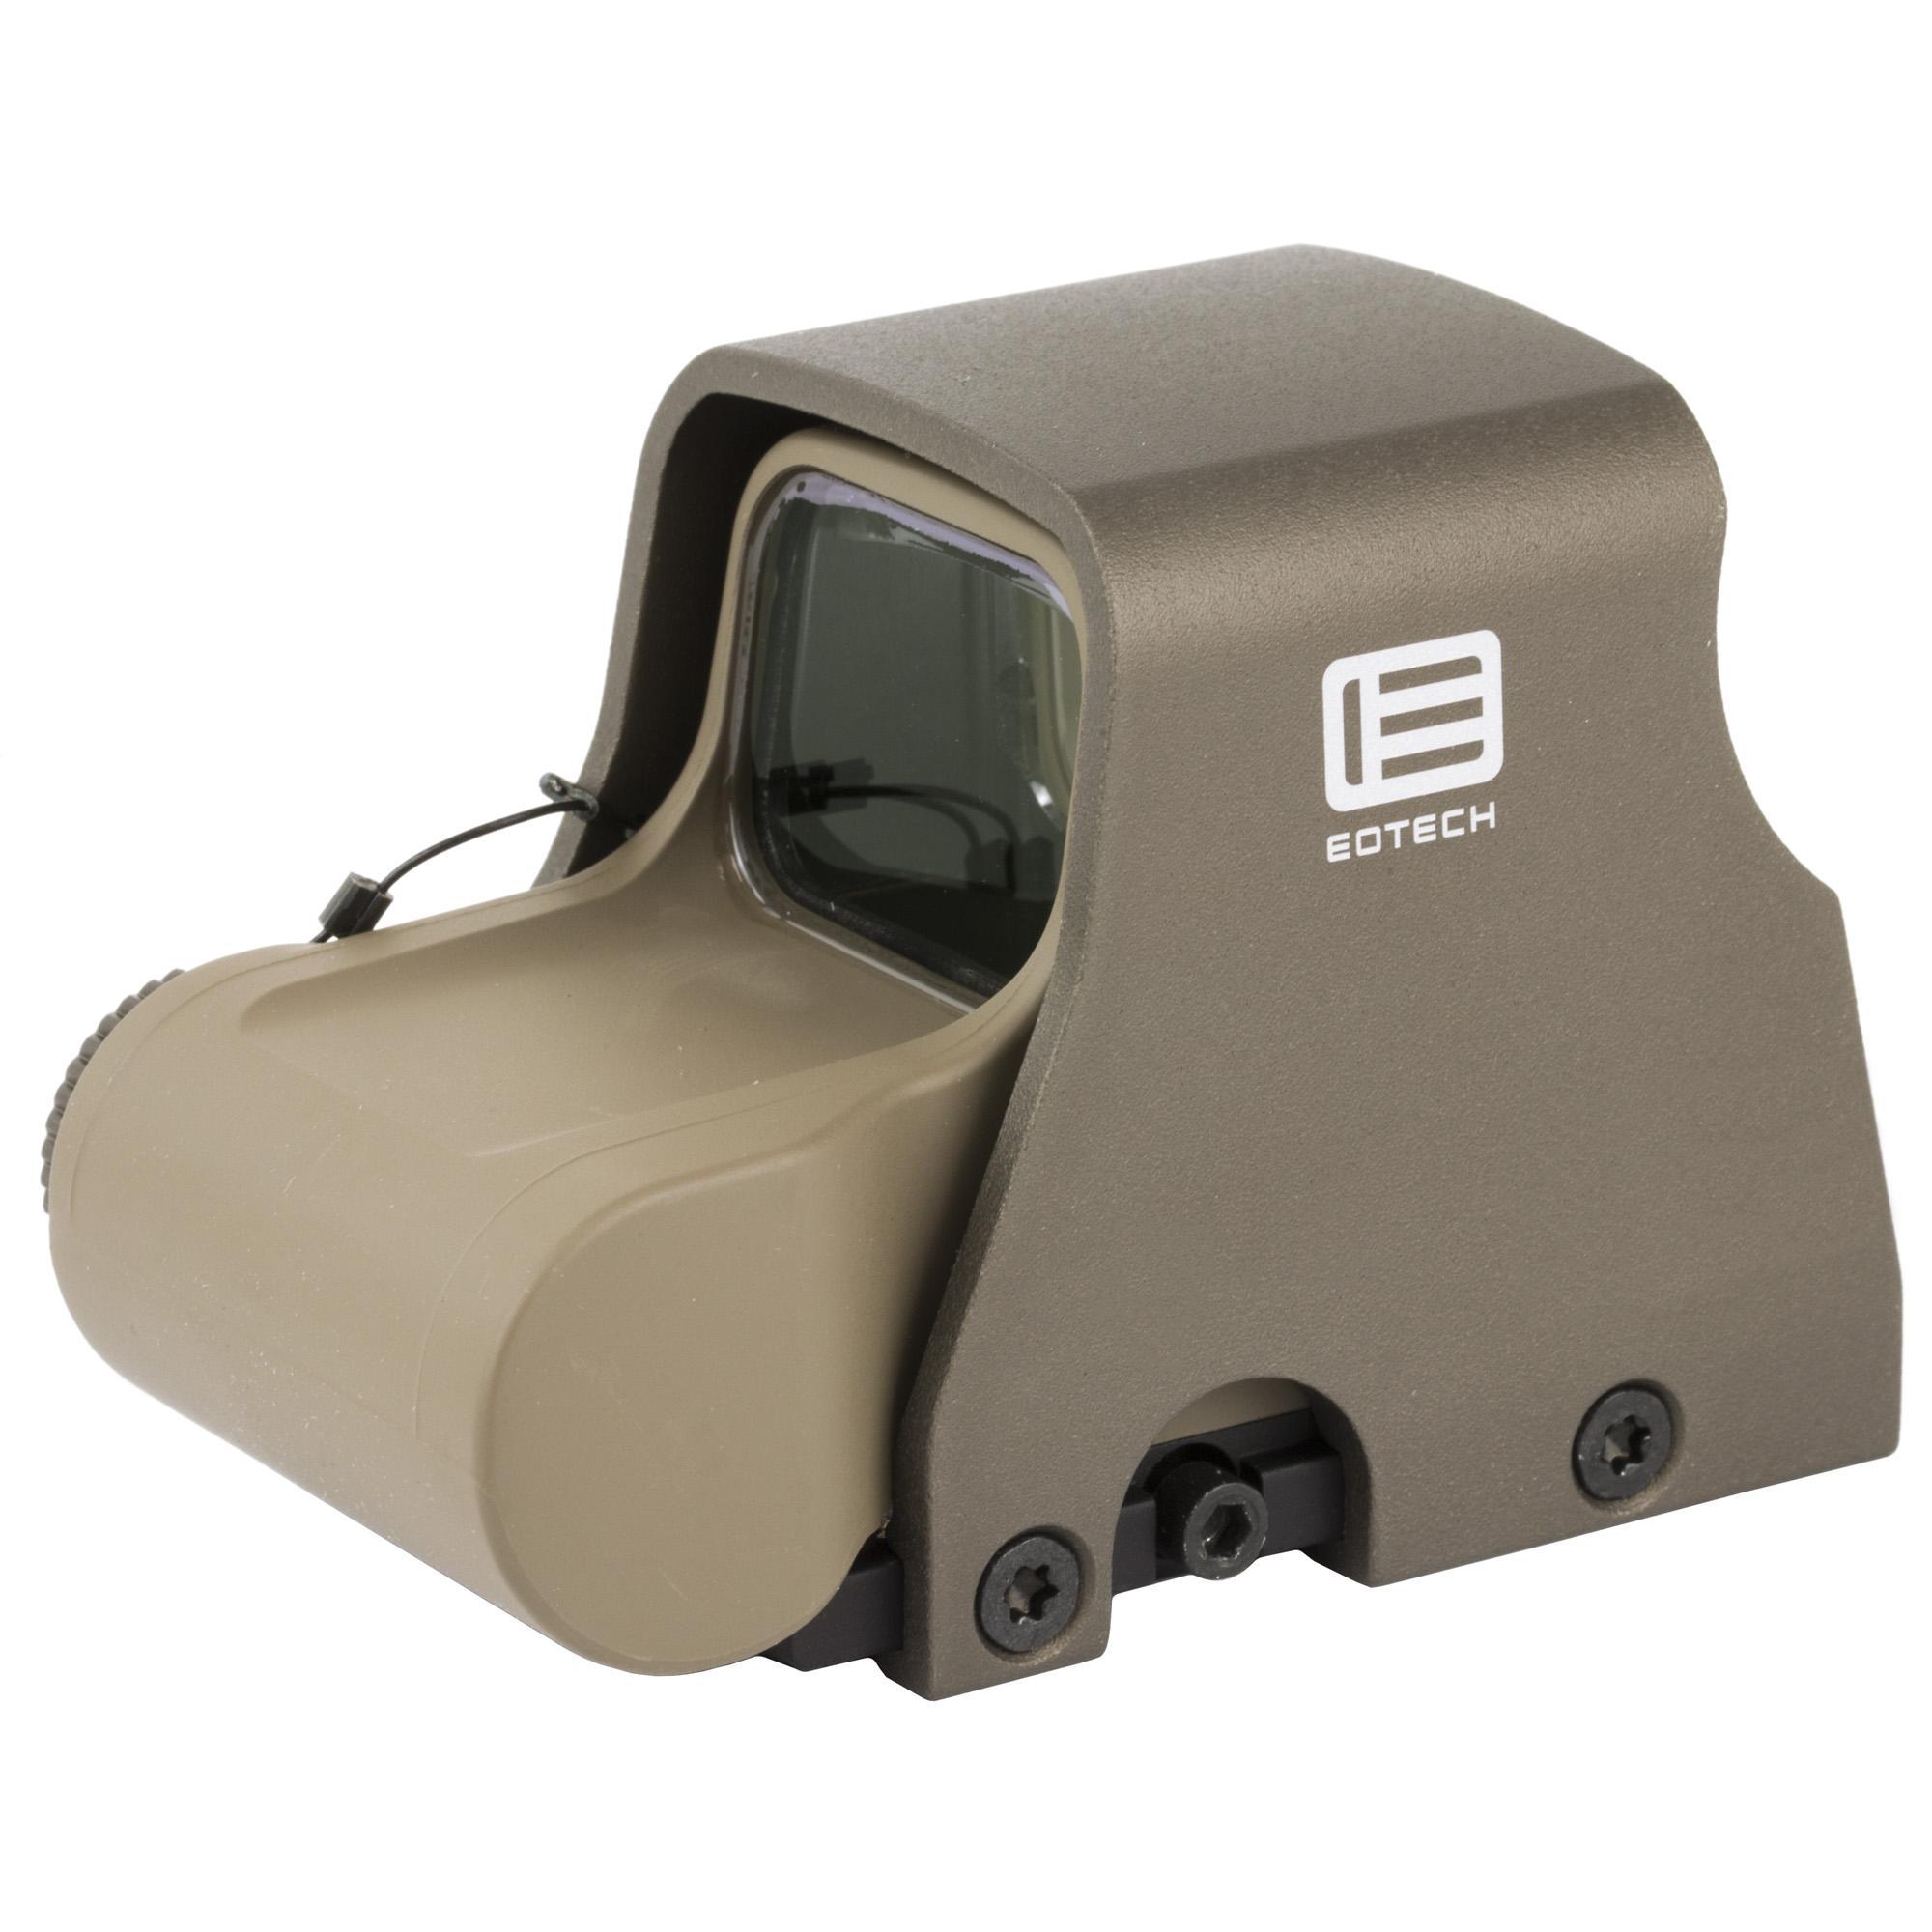 EOTech Eotech Xps2-2 68/2 Moa Cr123 Tan